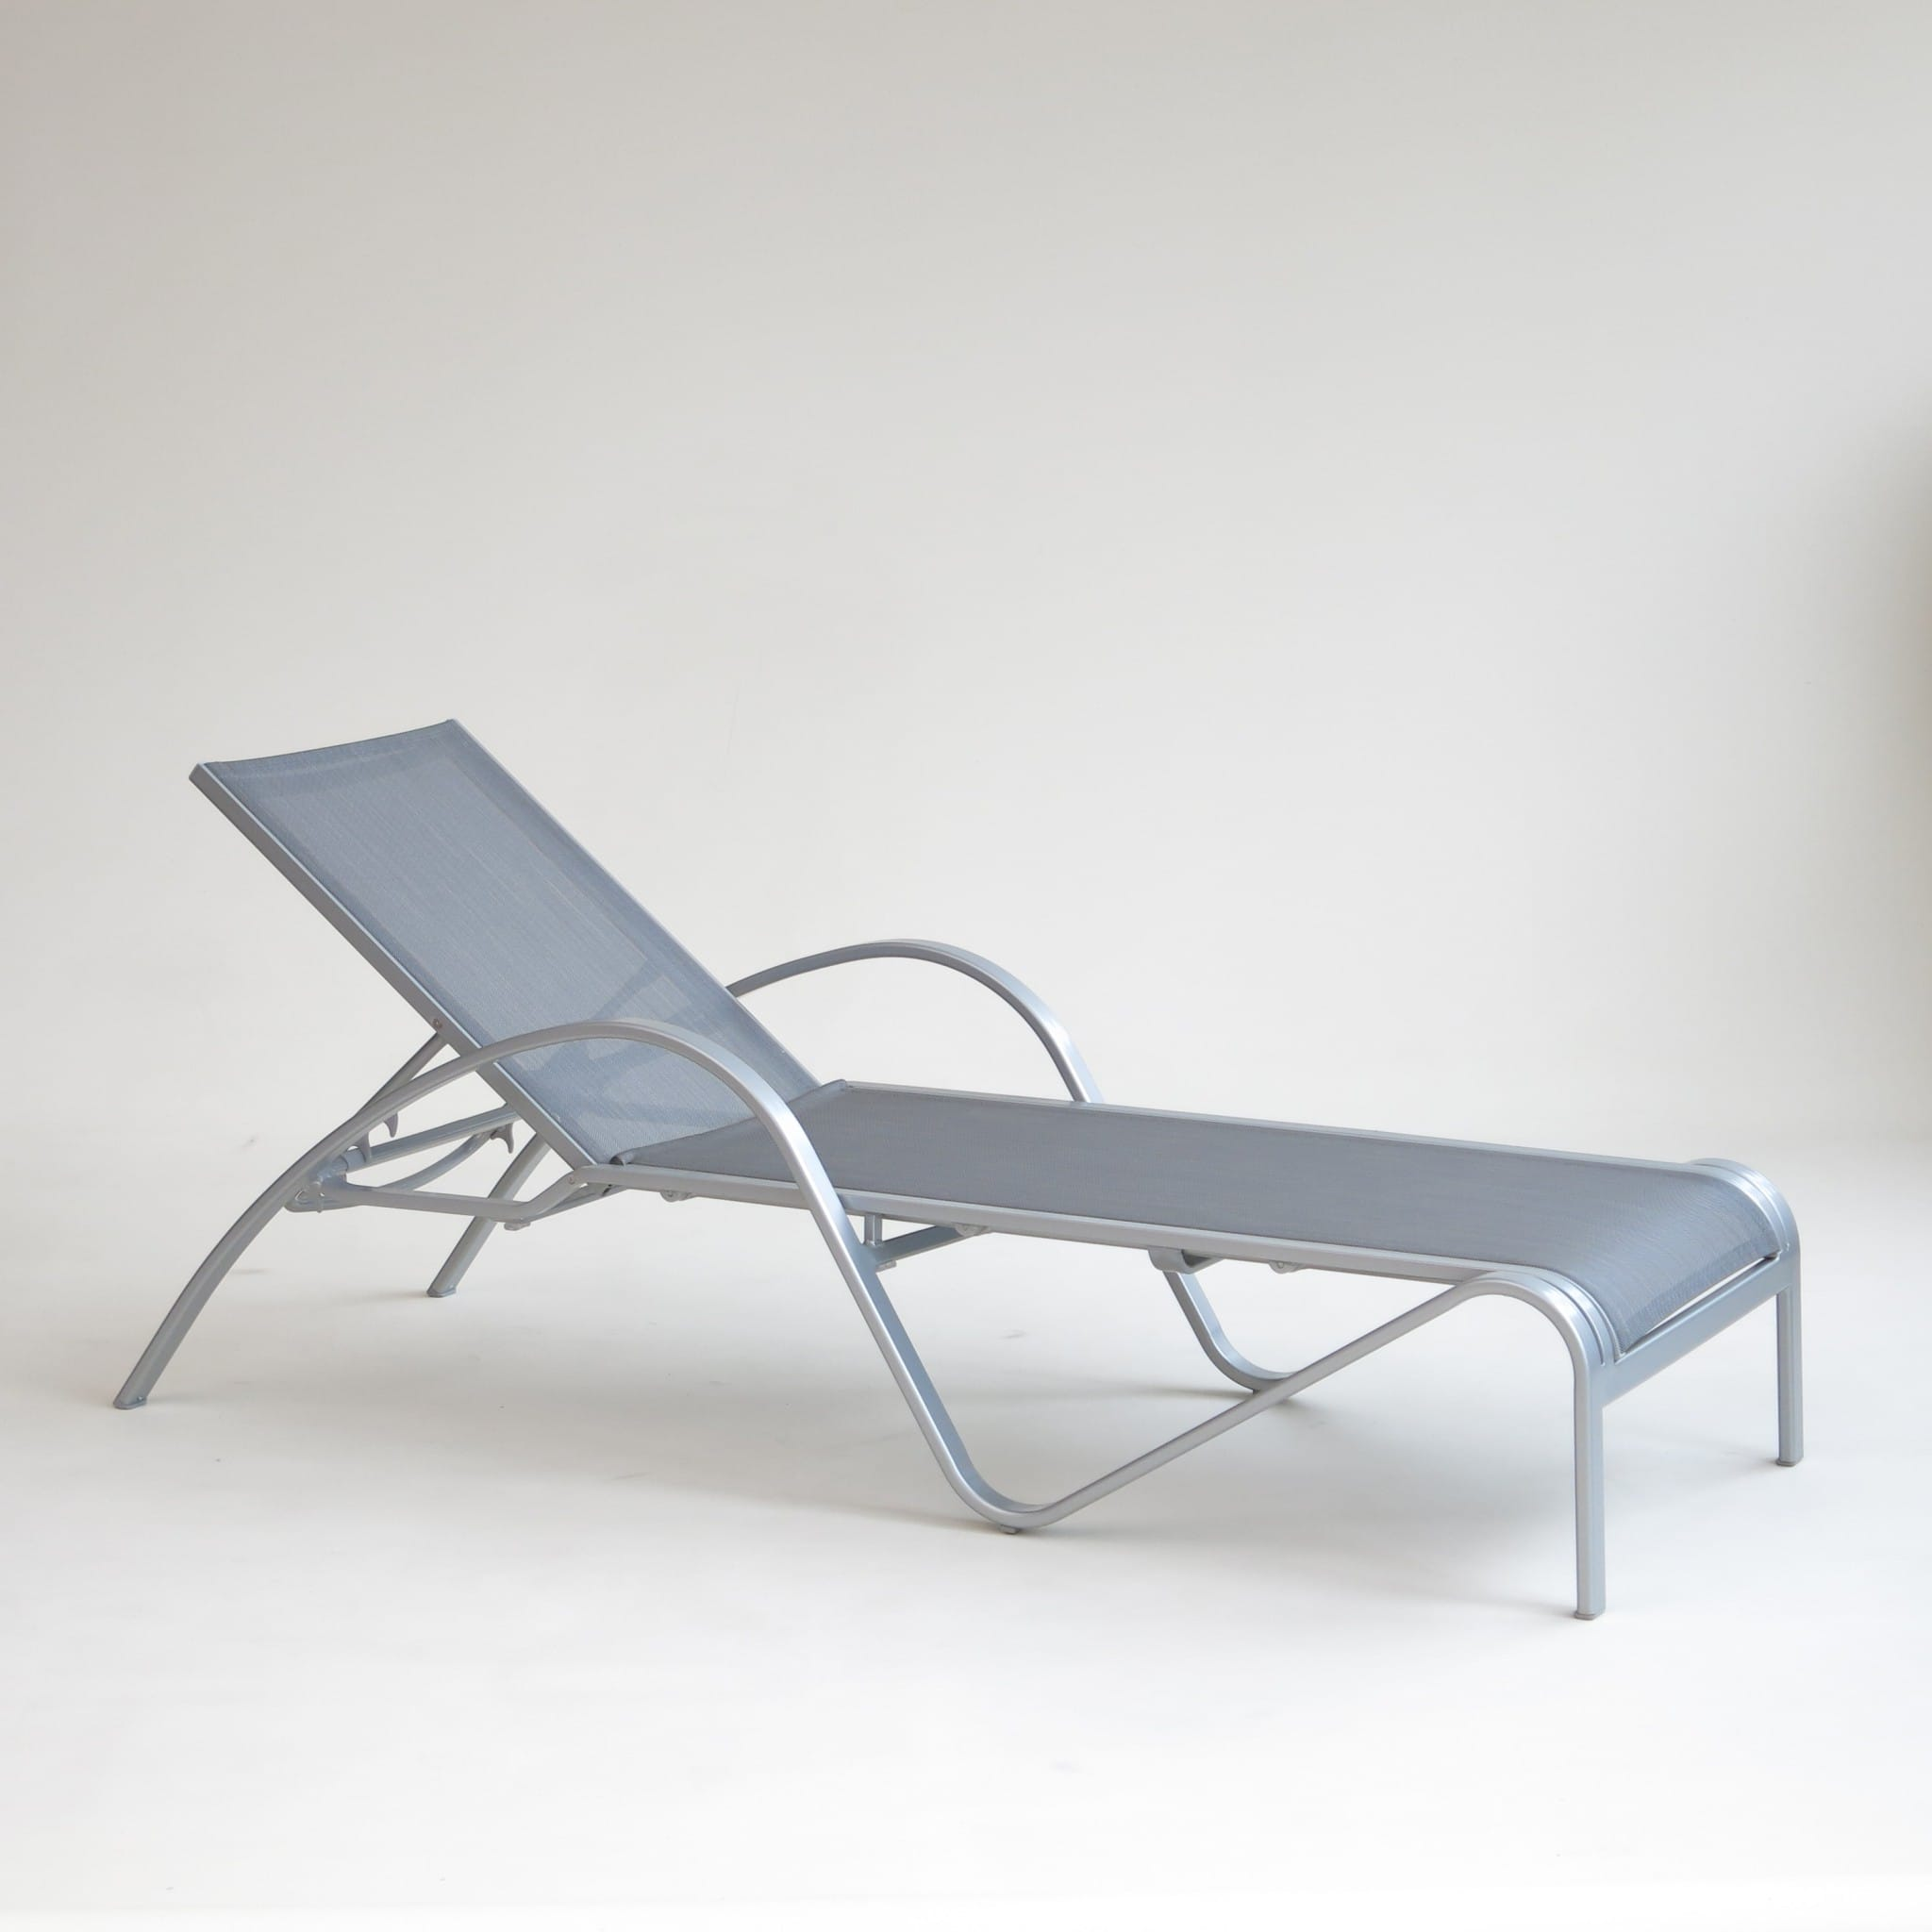 carma aluminium liege loung beach silber batyline. Black Bedroom Furniture Sets. Home Design Ideas